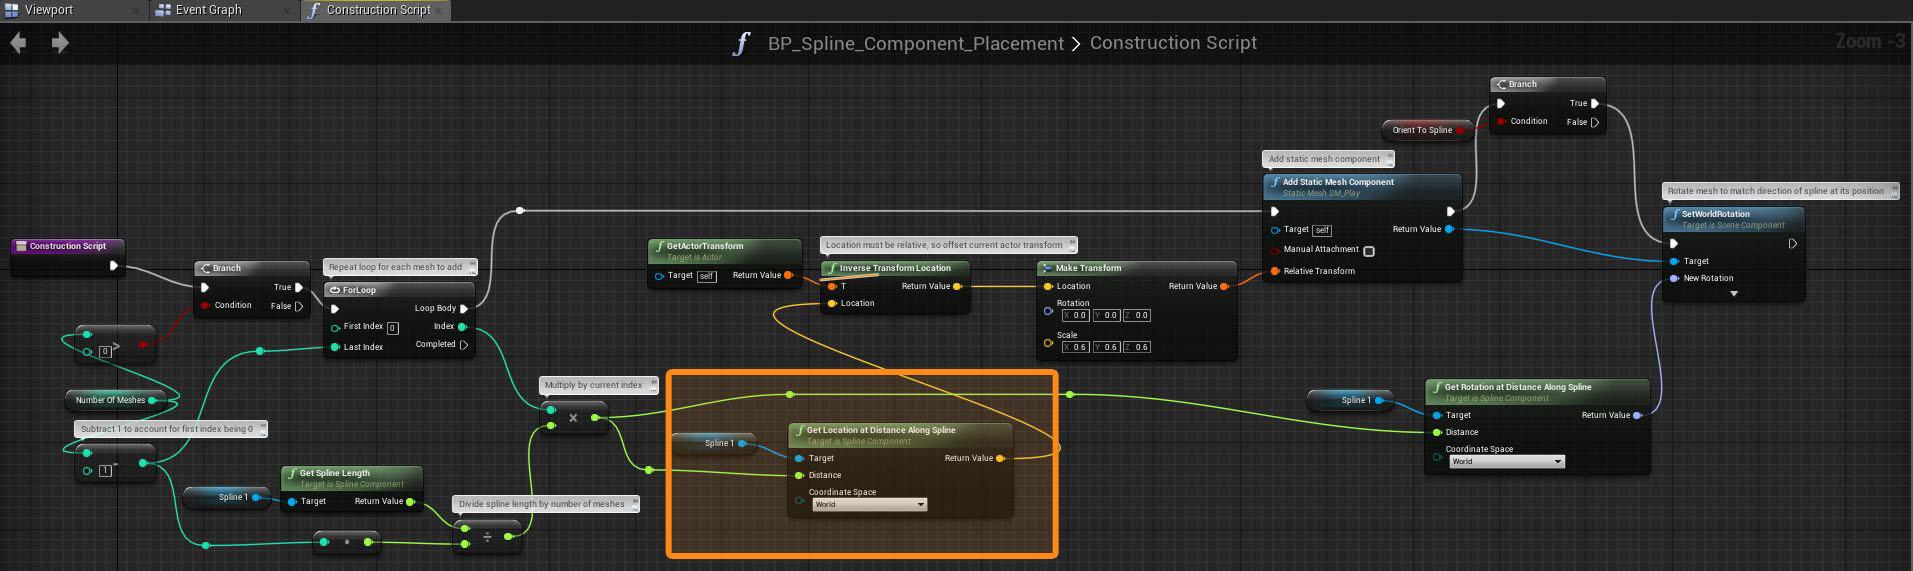 Example 1.2 screenshot 3